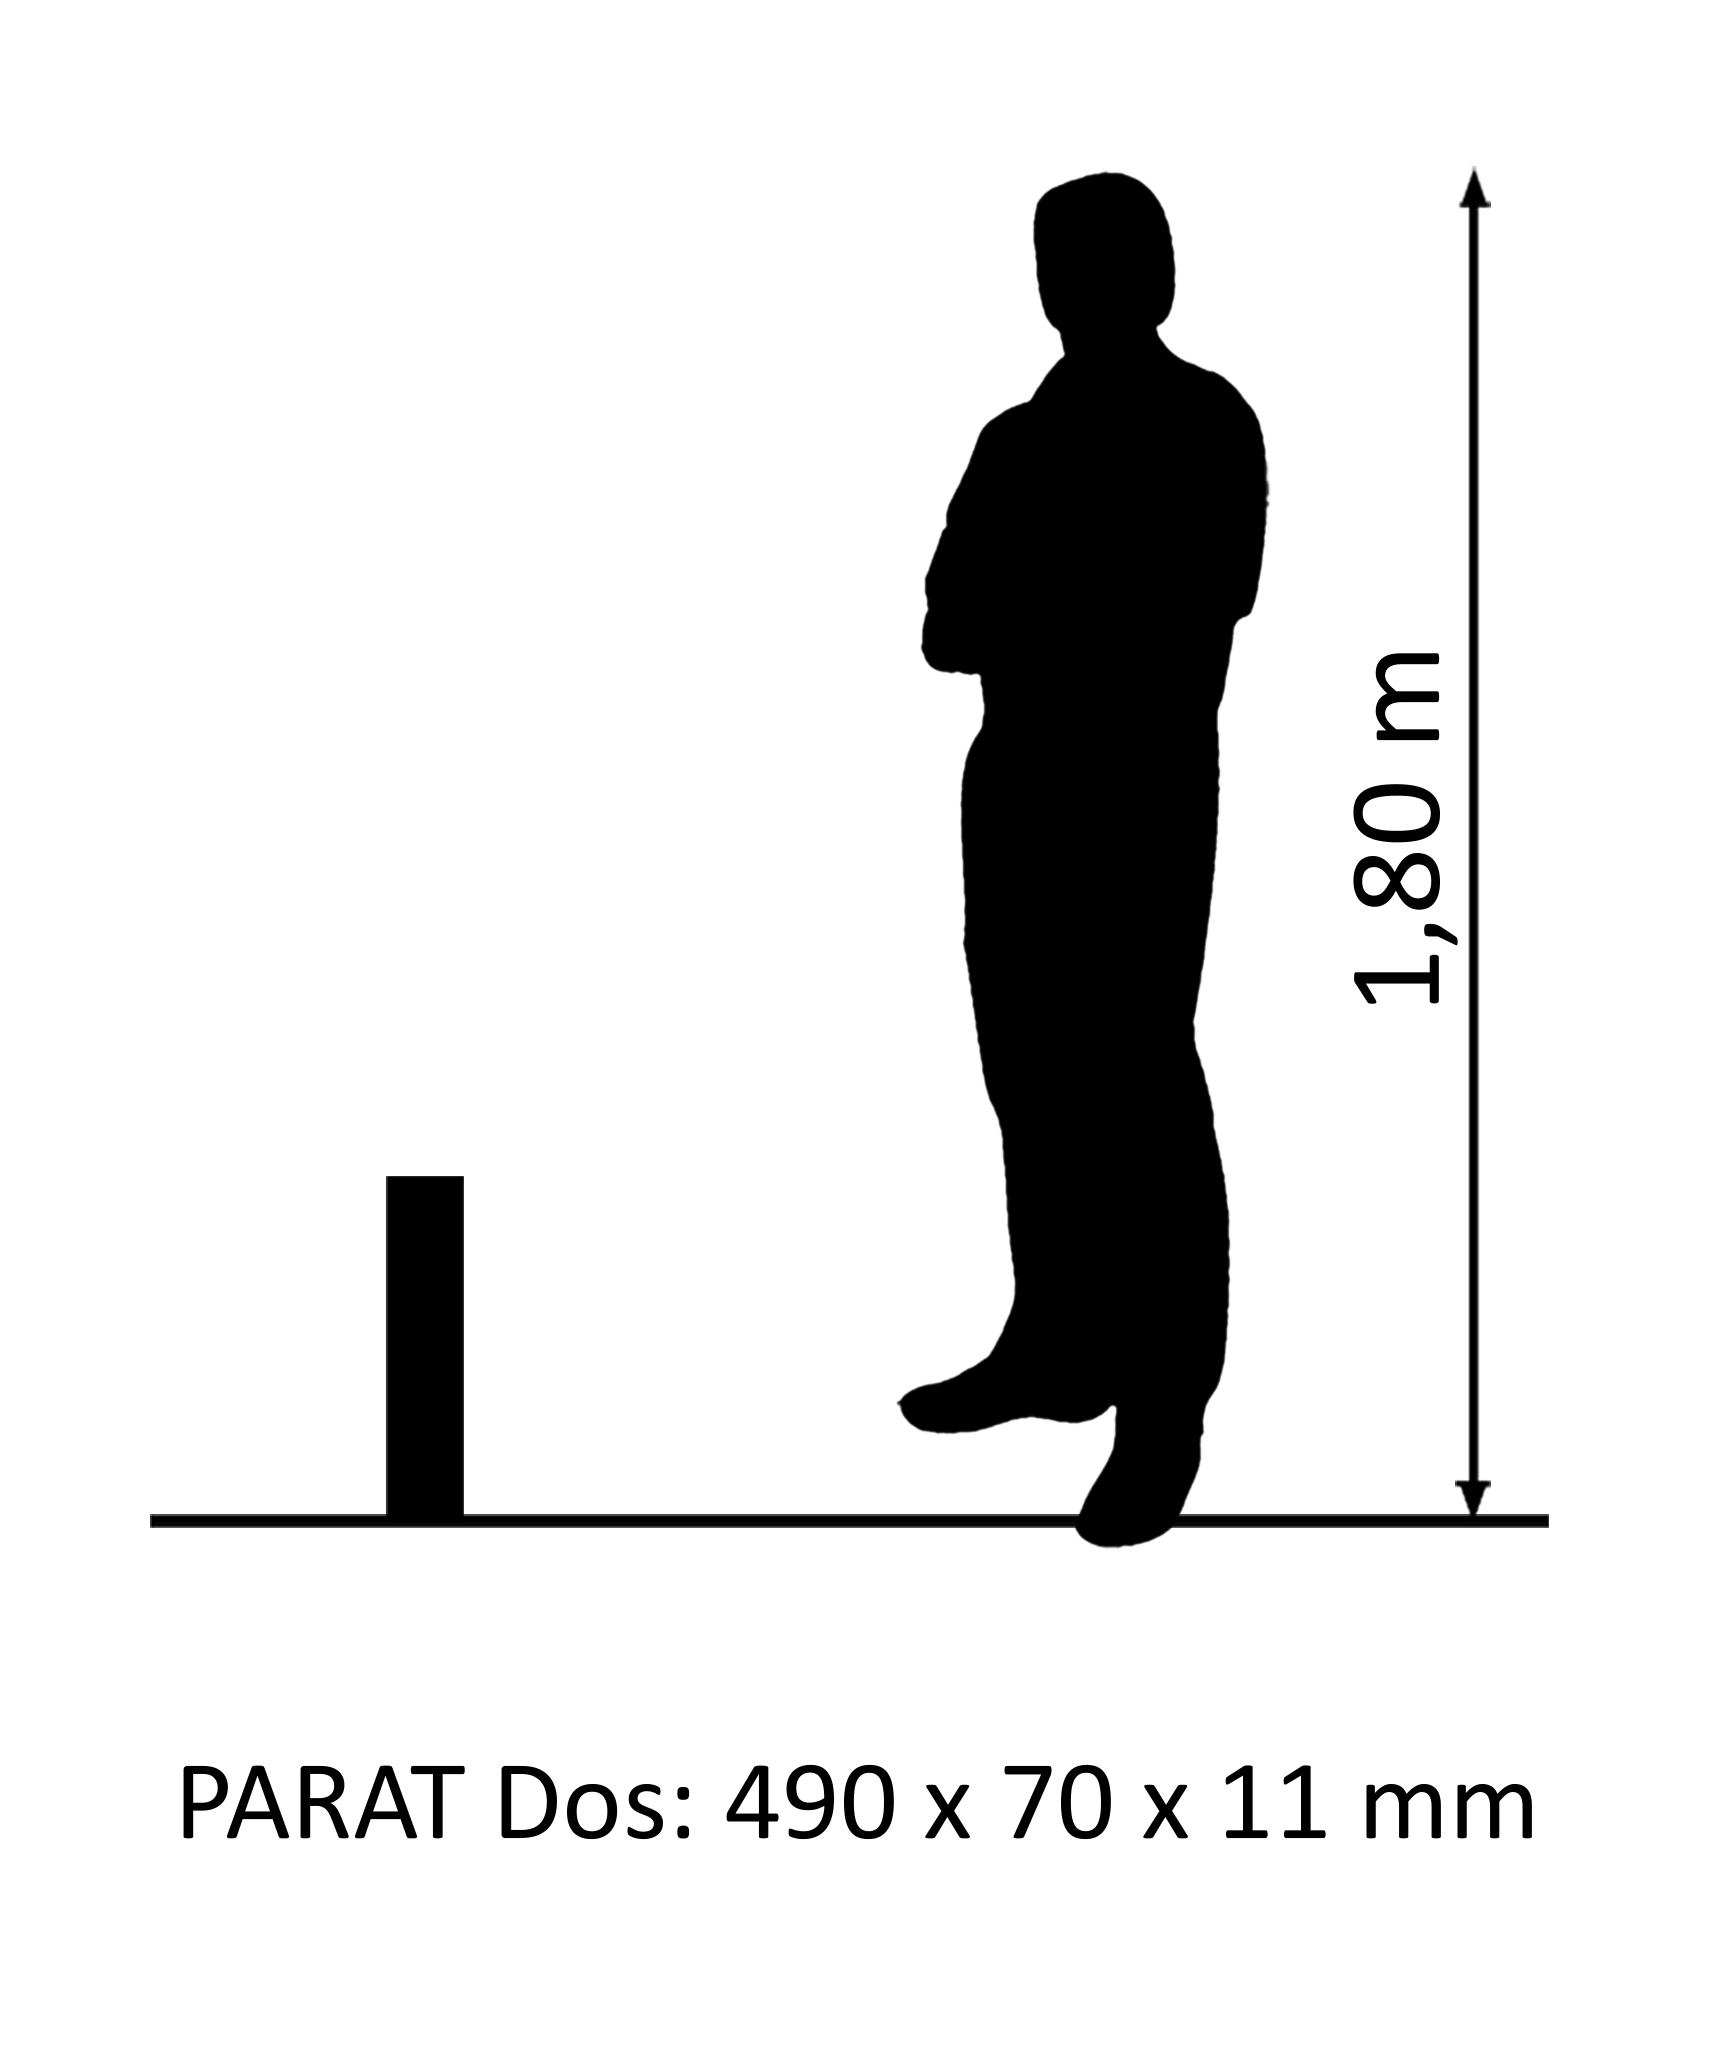 PARAT Dos Oak Umbra knotty 11mm